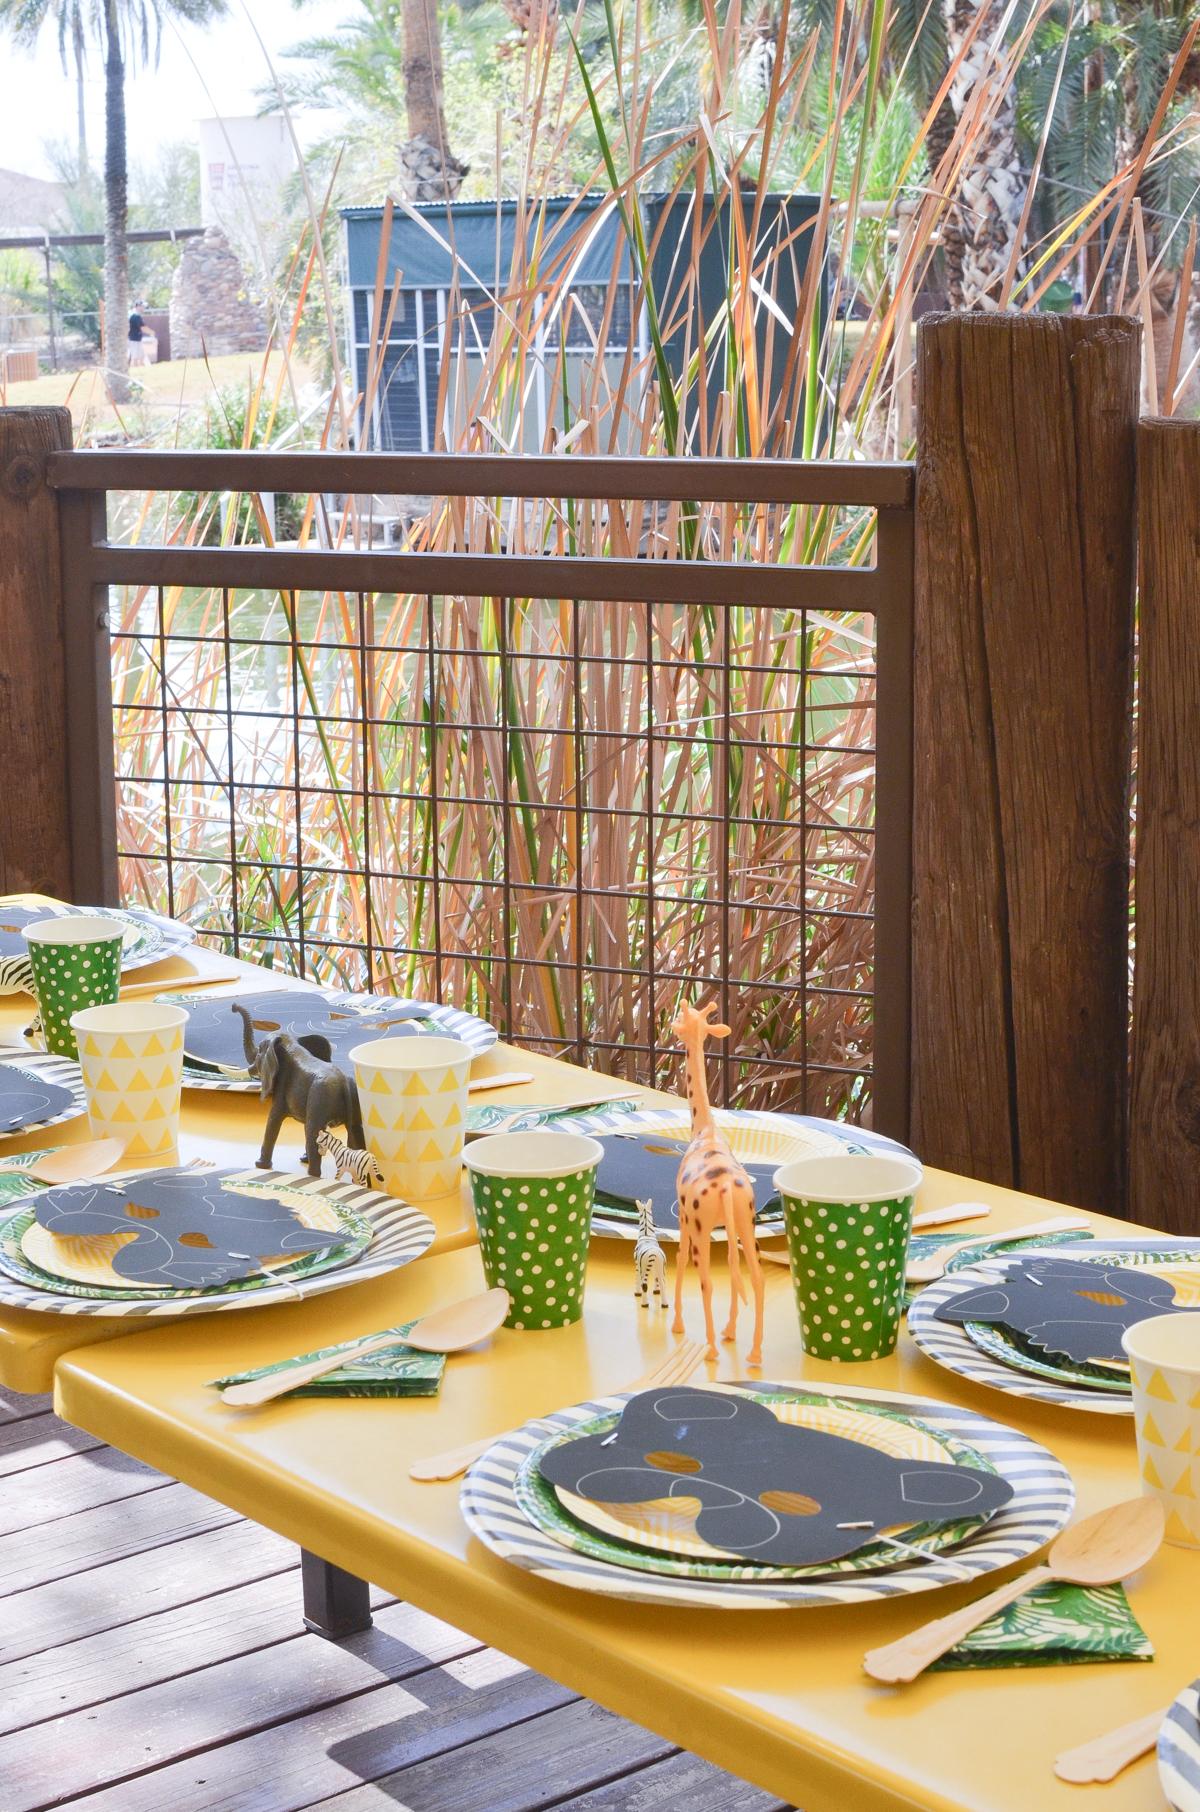 Phoenix Zoo Birthday Party | Zoo Party | Young Wild & Three | Safari Party